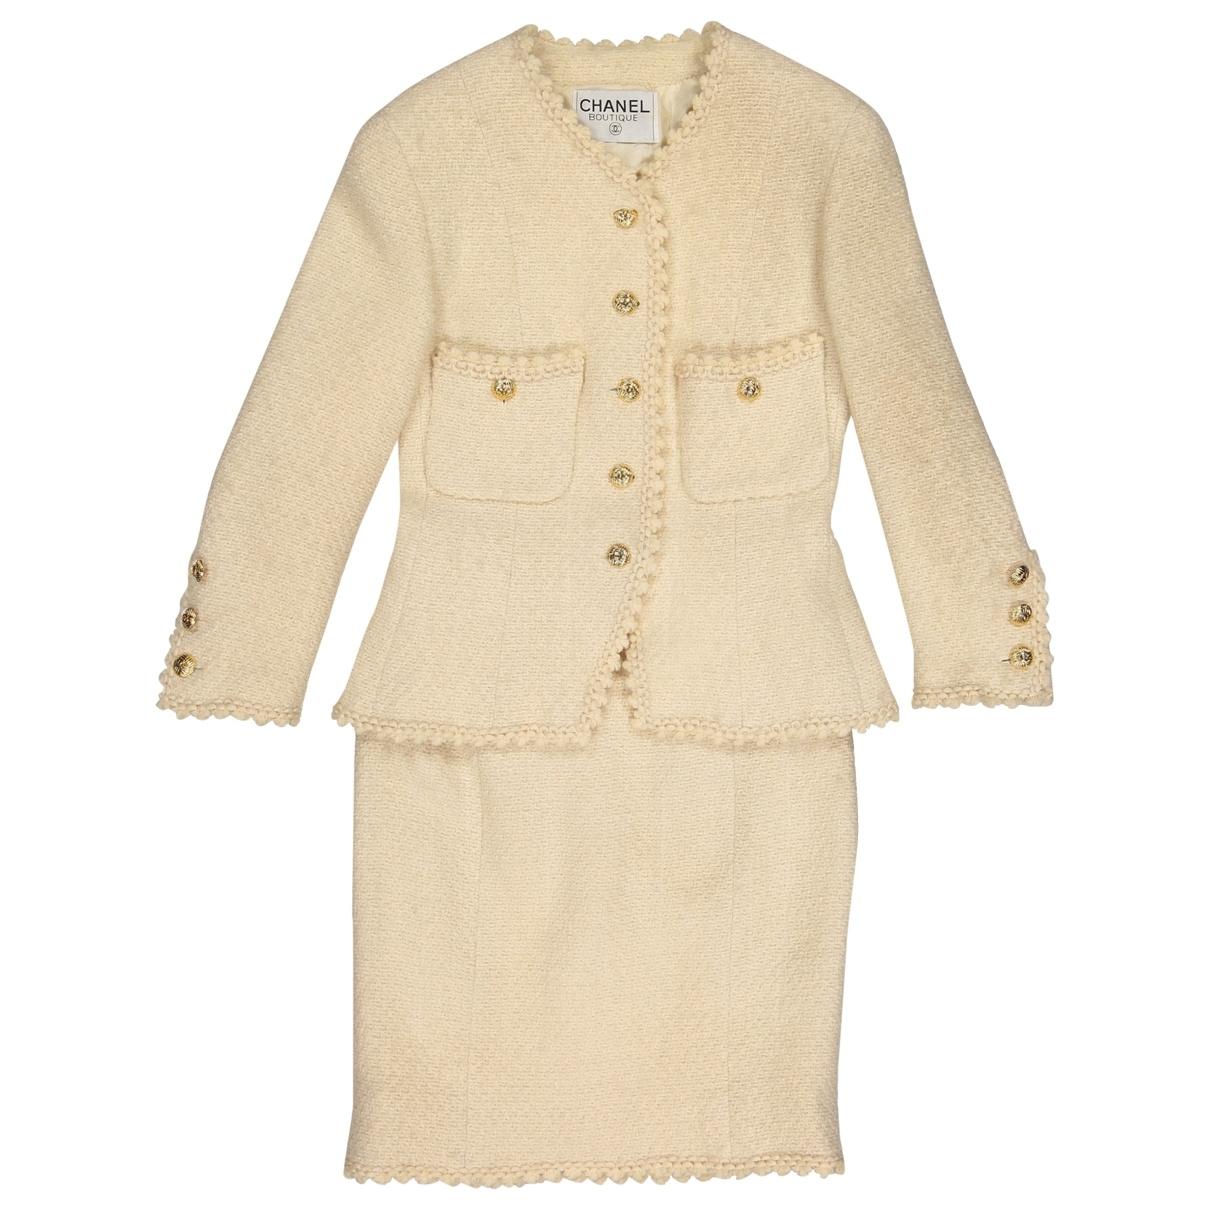 Chanel \N Kleidungsstuecke in  Ecru Wolle